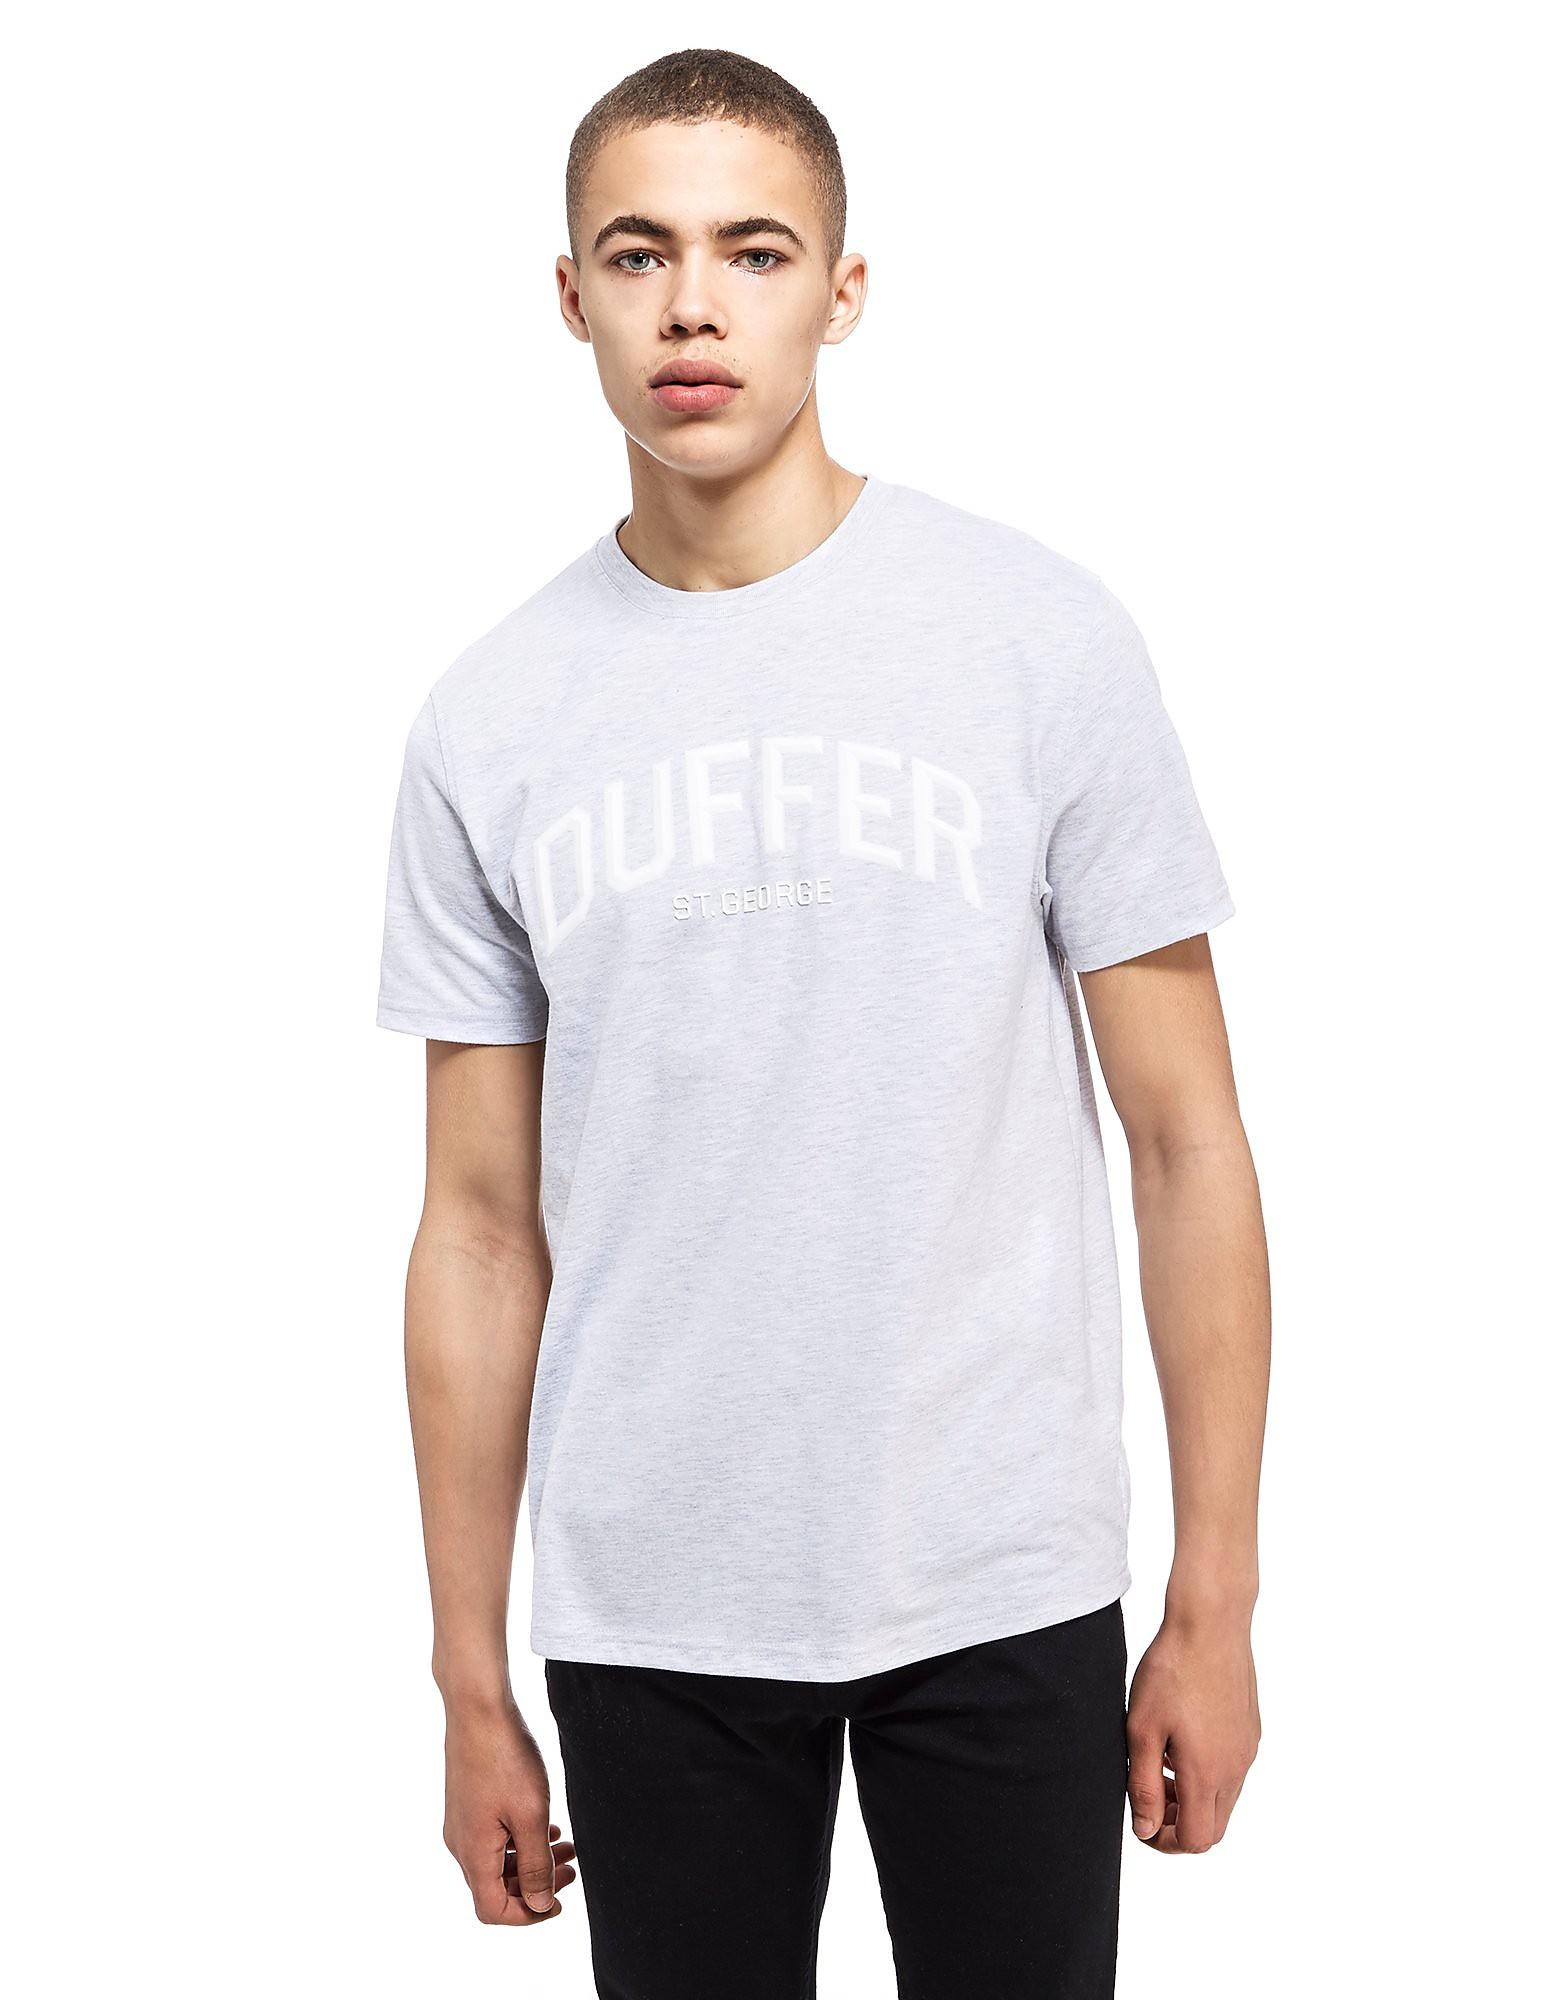 Duffer of St George Input T-Shirt